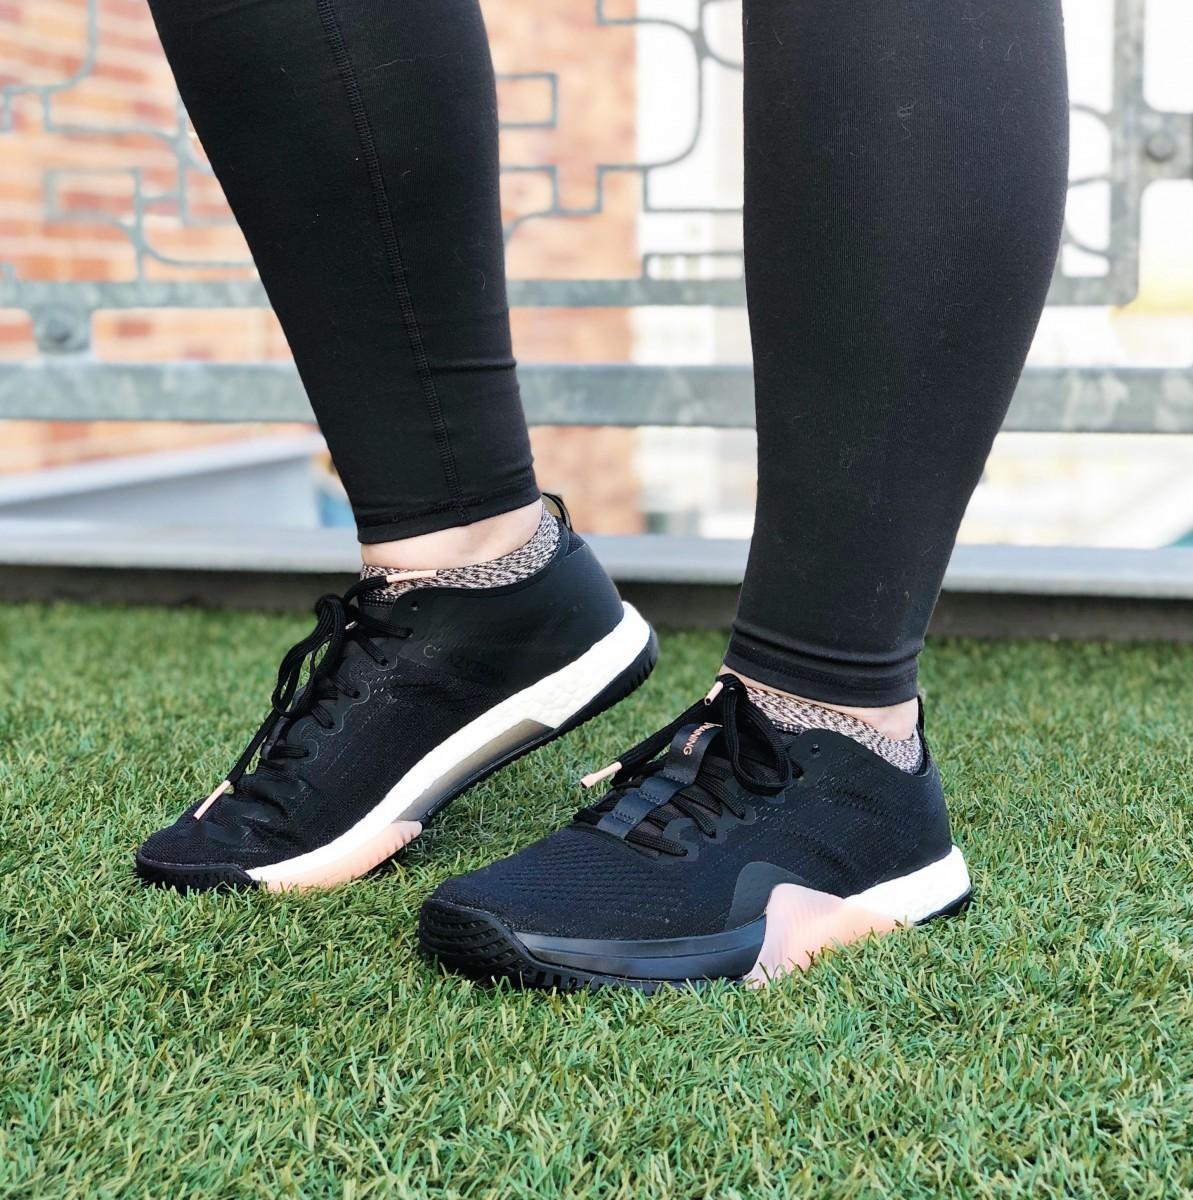 Adidas Crazytrain Elite Shoes - Her Heartland Soul